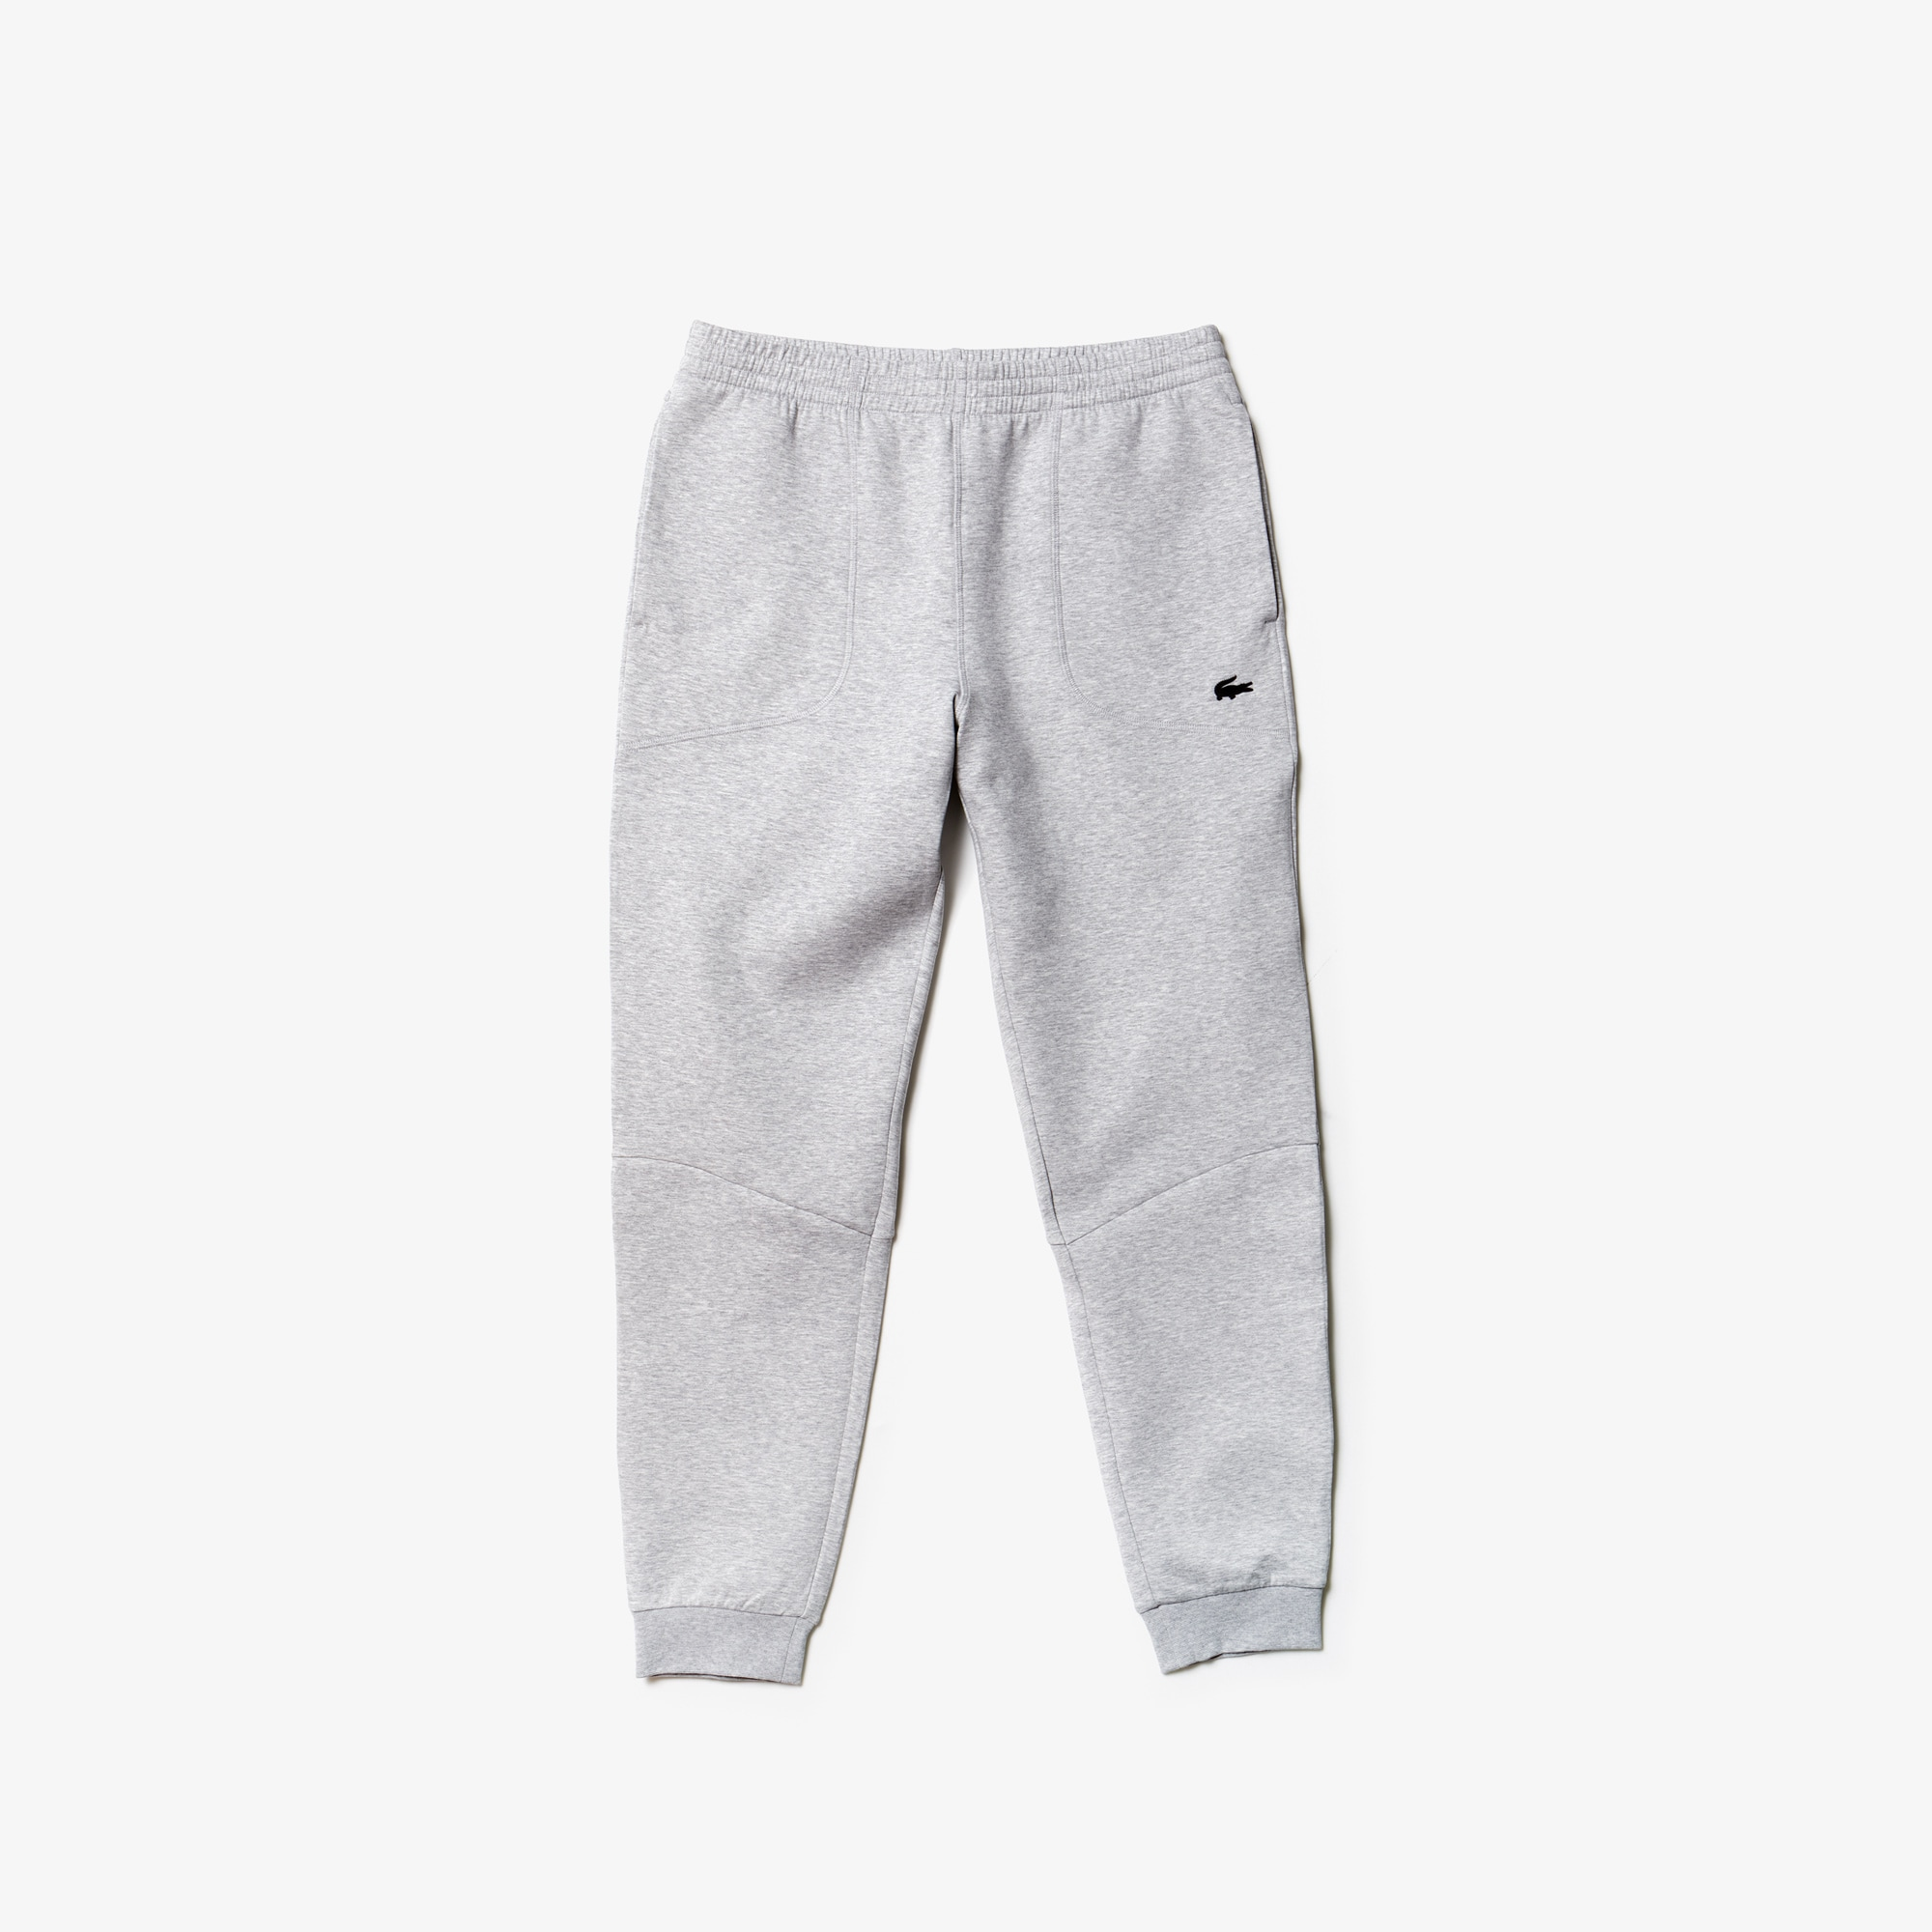 Mens 라코스테 Lacoste Motion Fleece Sweatpants,grey chine